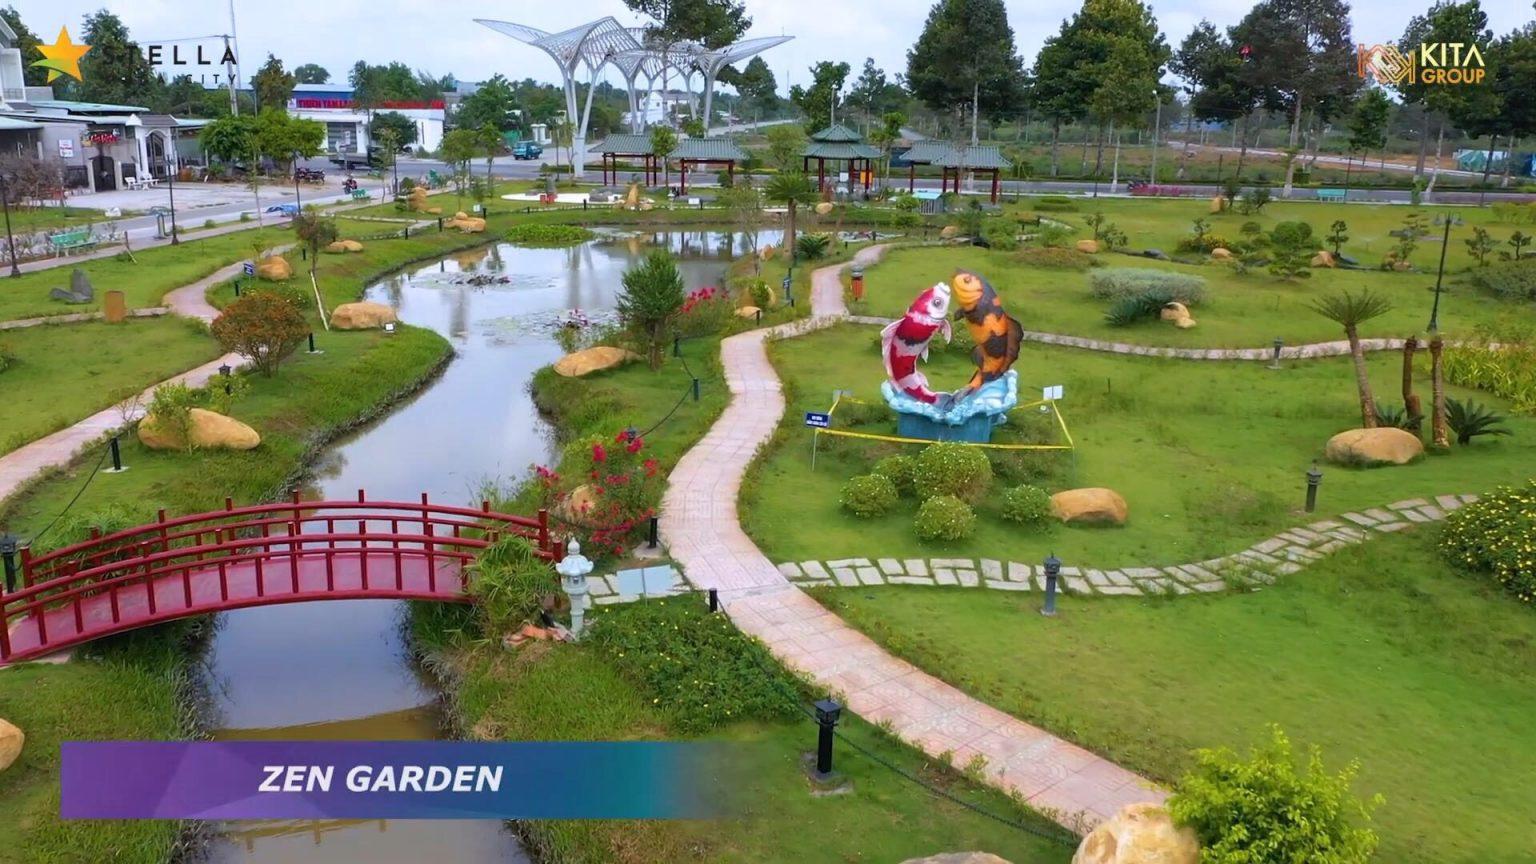 Stella Mega City công viên zen garden